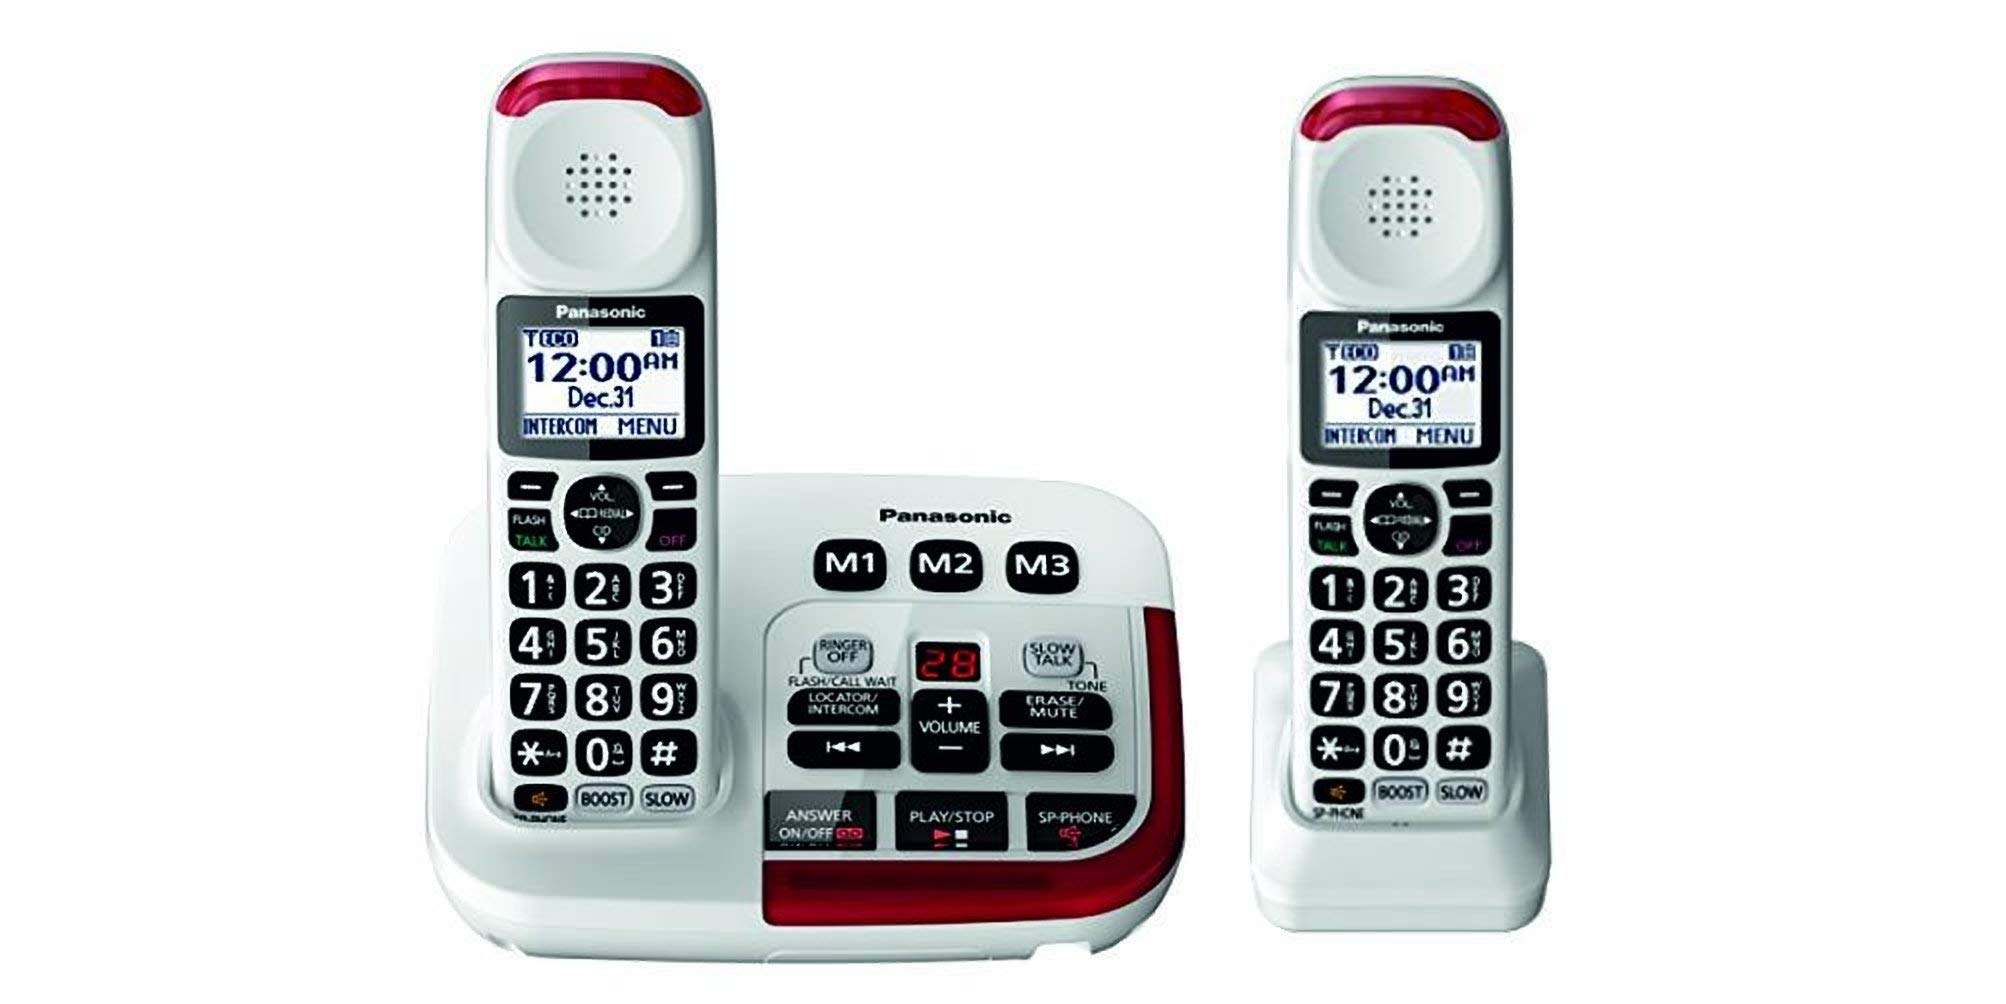 Panasonic KX-TGM420W + (1) KX-TGMA44W Amplified Cordless Phone with Digital Answering Machine and Voice Volume Booster upto 40 dB (2 Handsets) by Panasonic